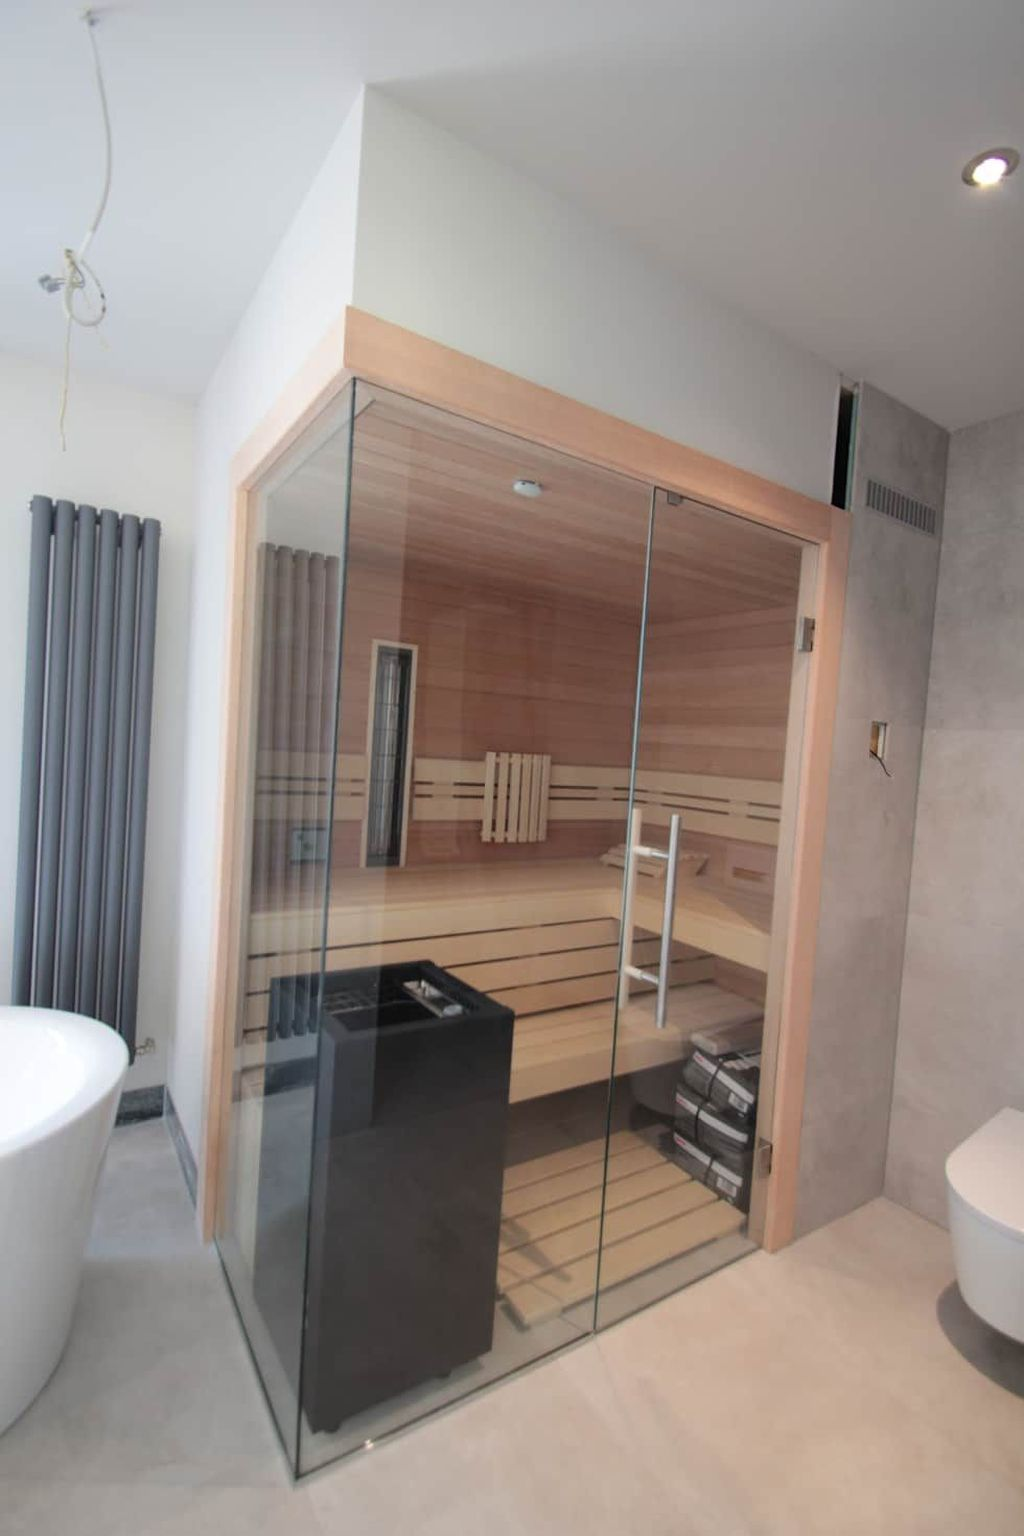 38 Easy And Cheap Diy Sauna Design You Can Try At Home Diy Sauna Haus Deko Badezimmer Mit Sauna